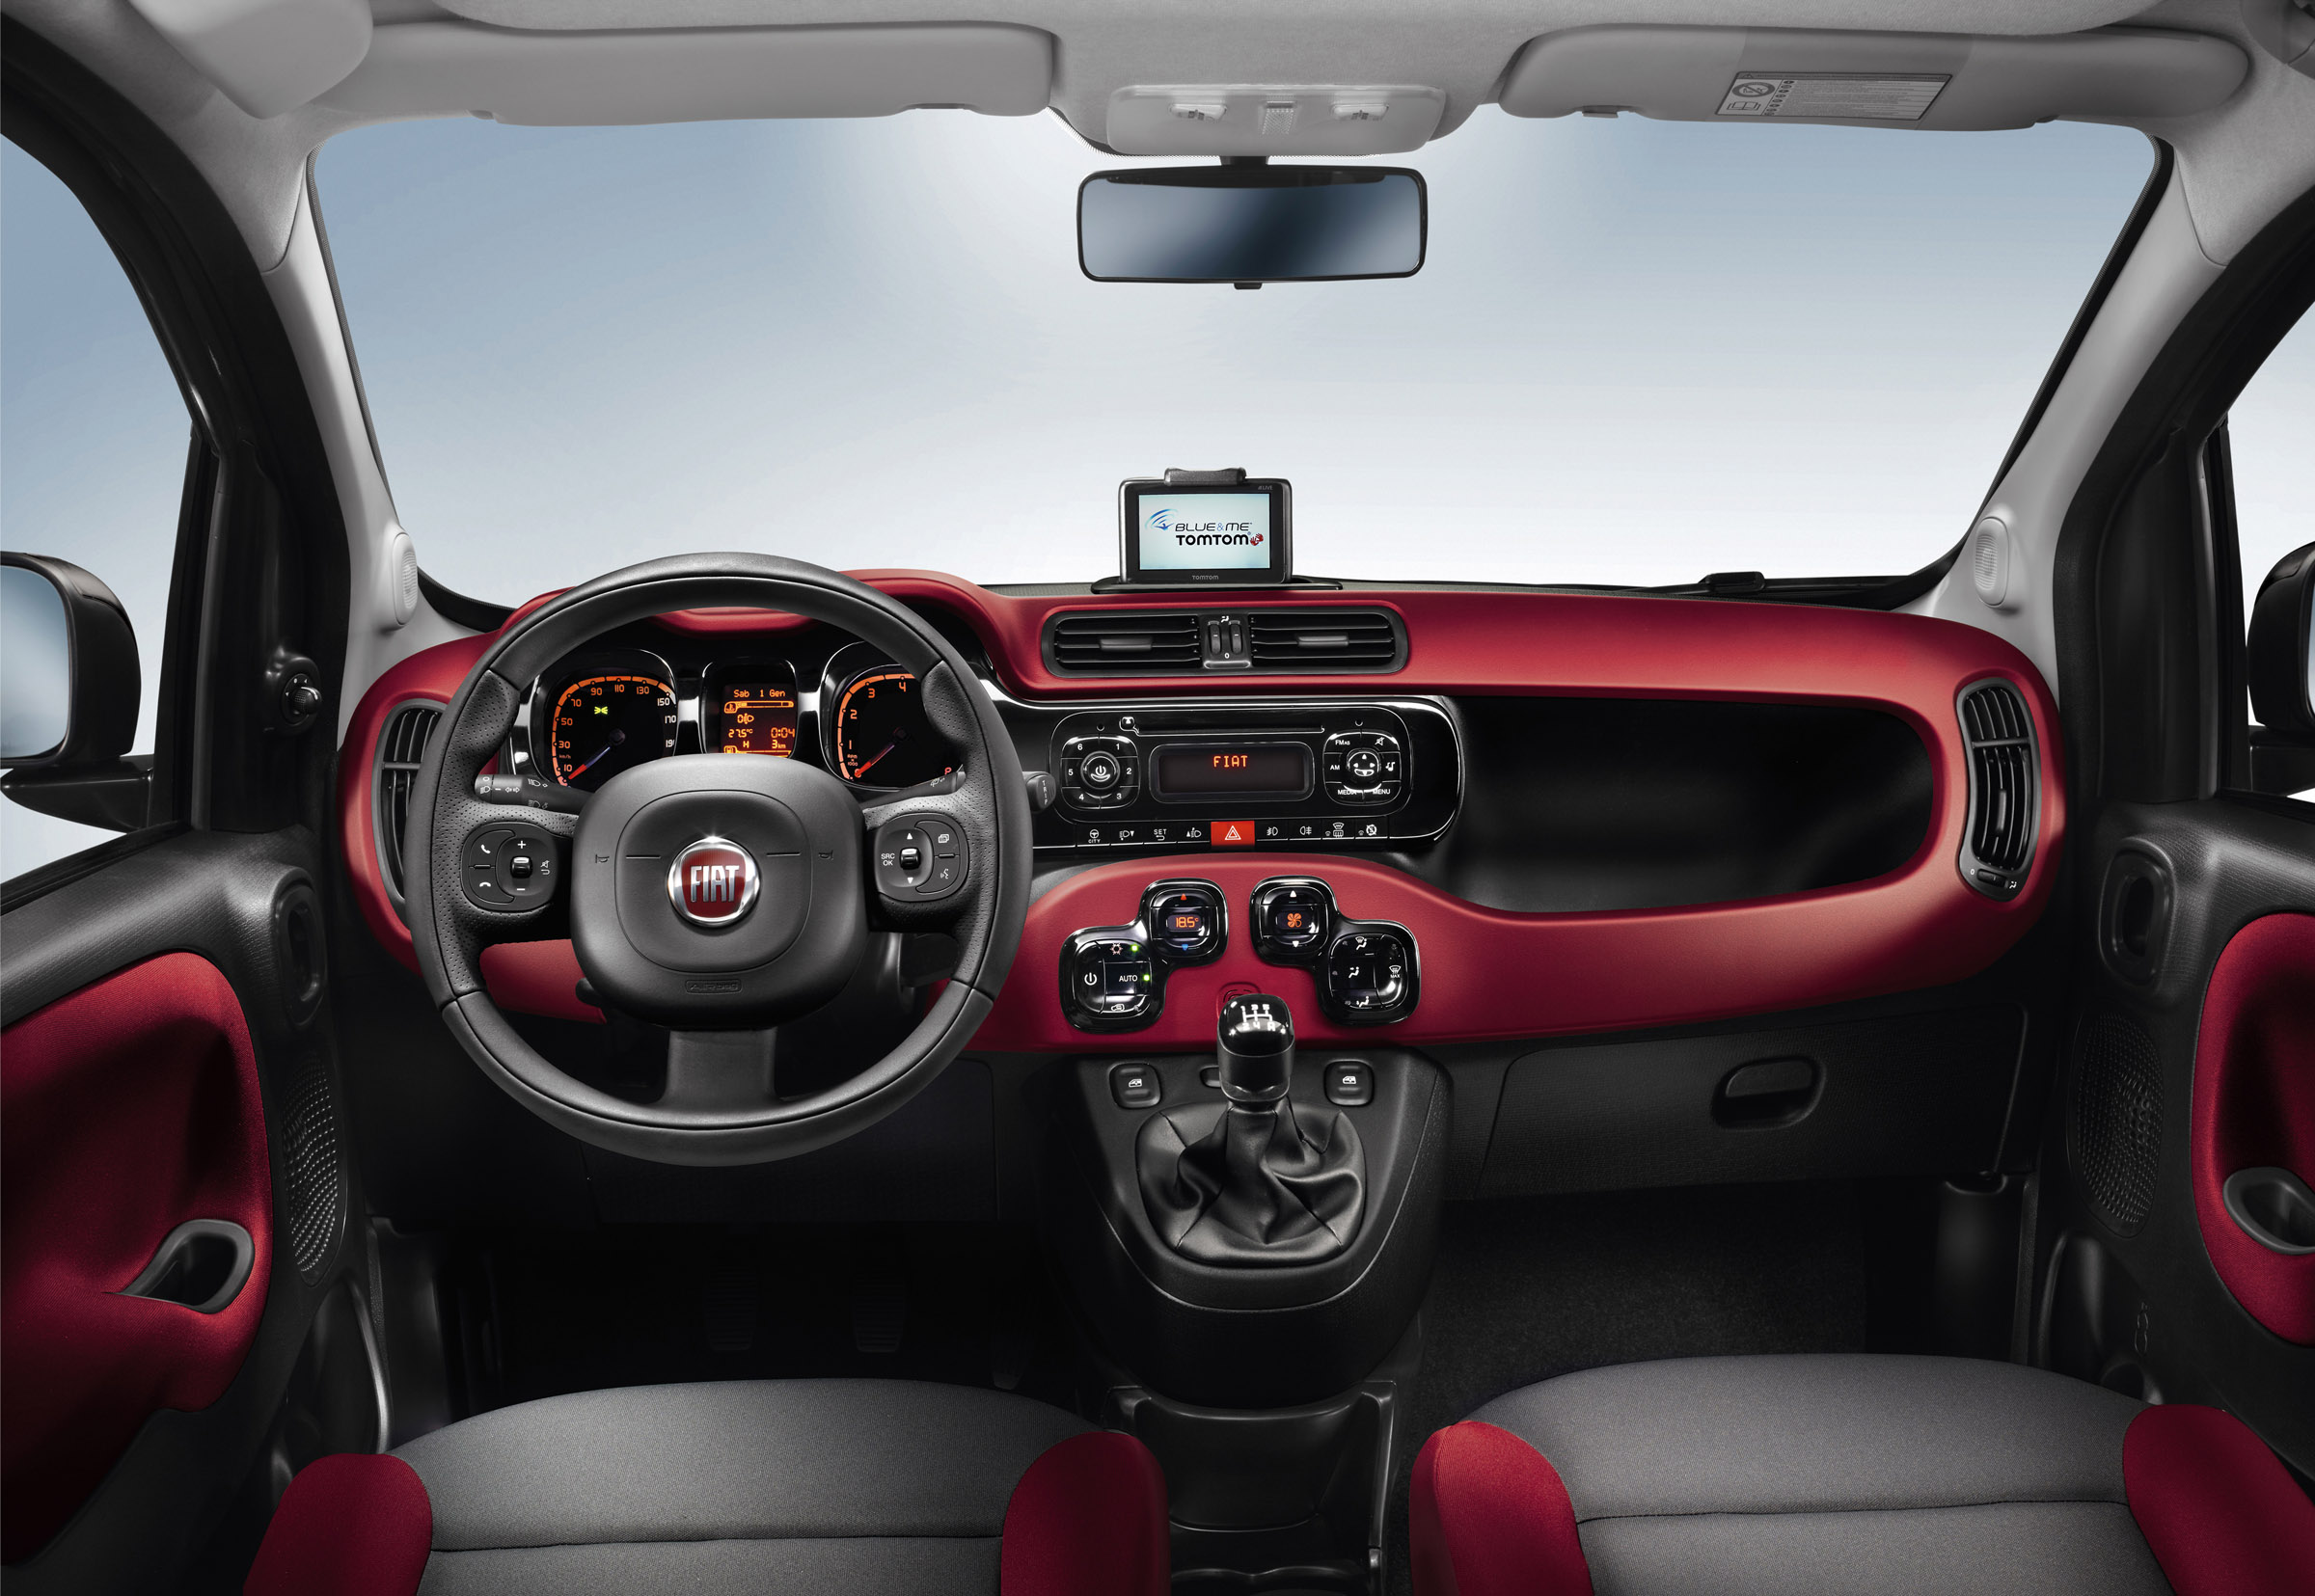 2012 Fiat Panda Picture 62226